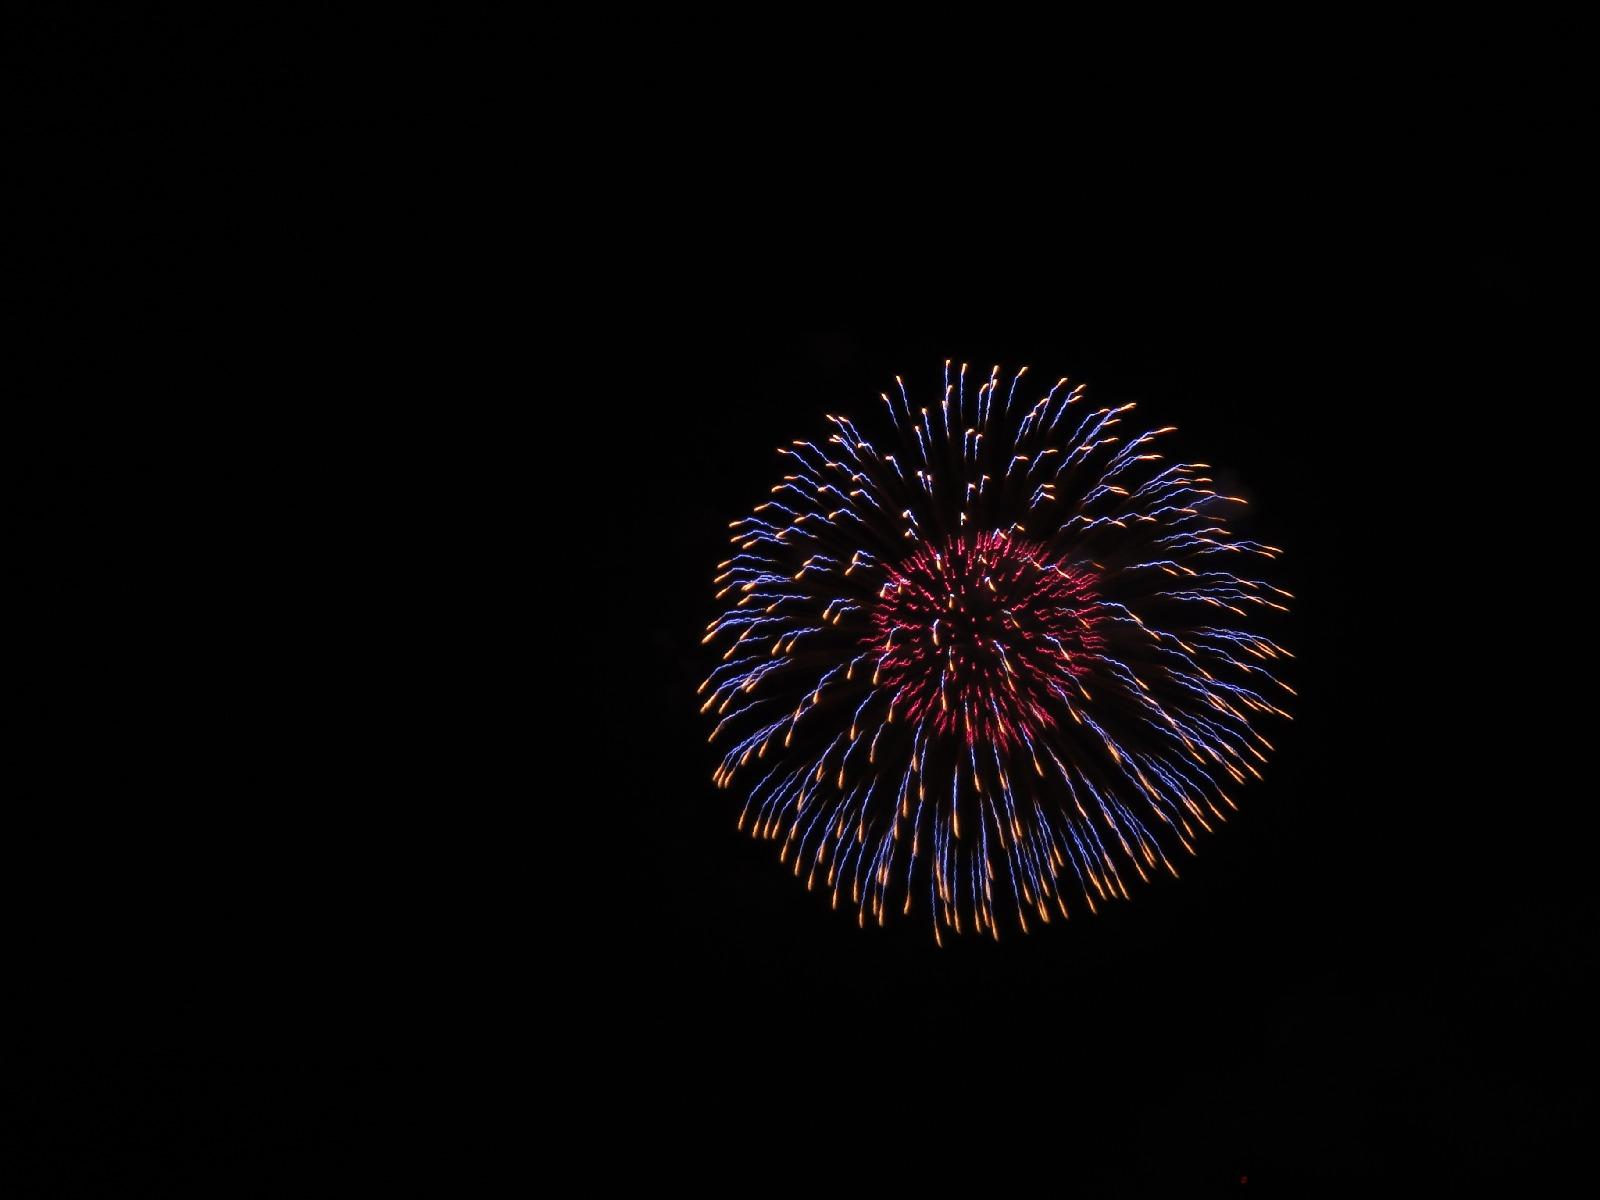 120728kasaokafireflower_039.jpg